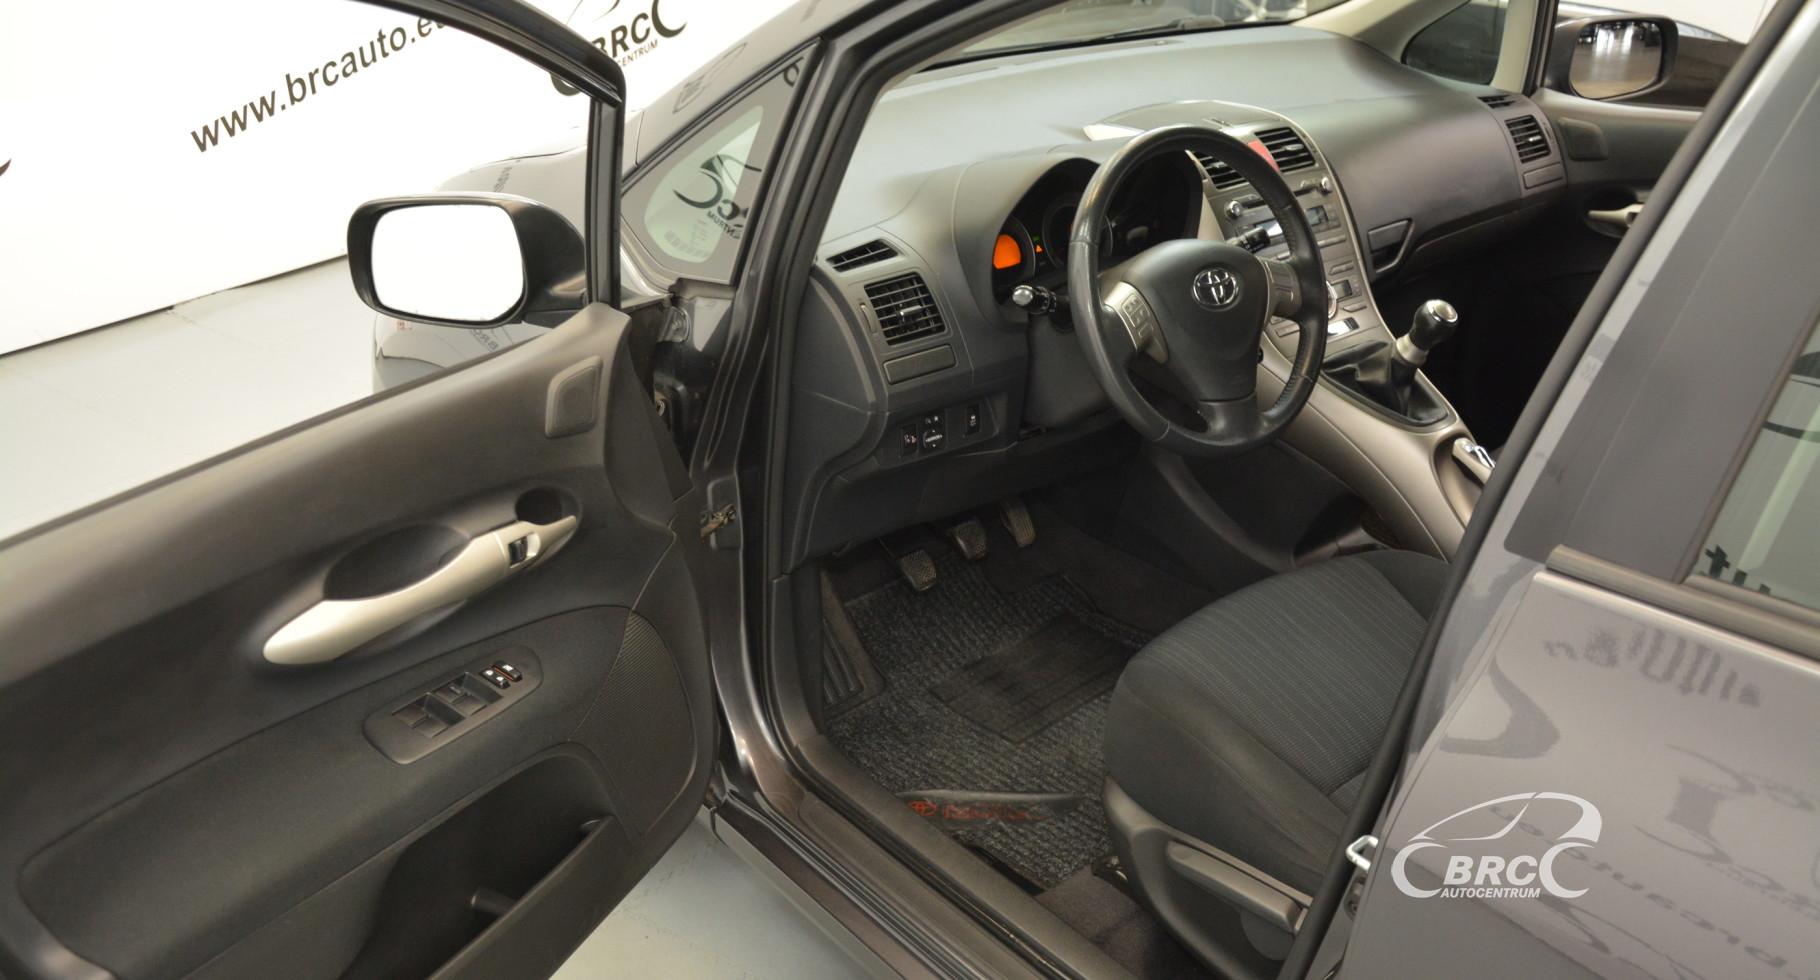 Toyota Auris 1.6 VVT-i LineSol